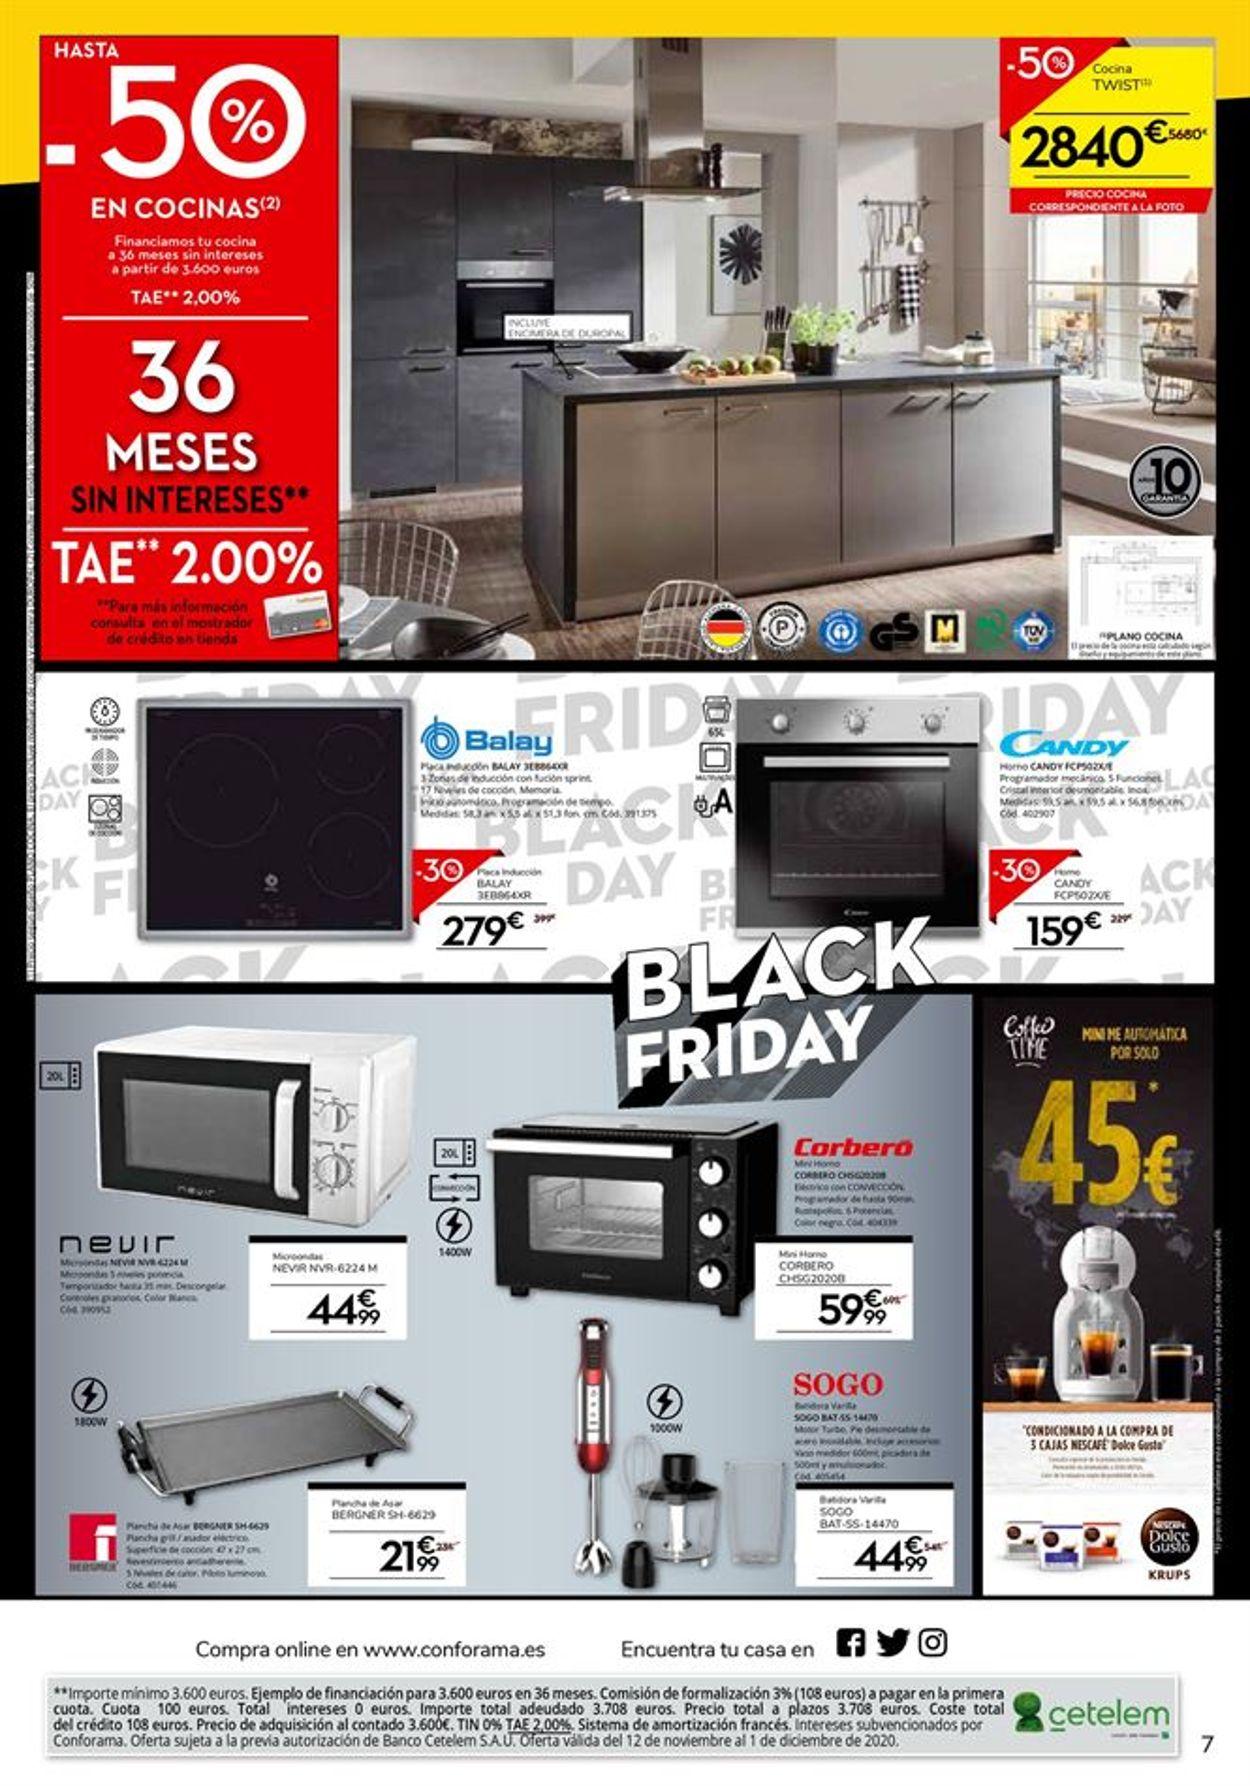 Conforama - Black Friday 2020 Folleto - 12.11-01.12.2020 (Página 7)